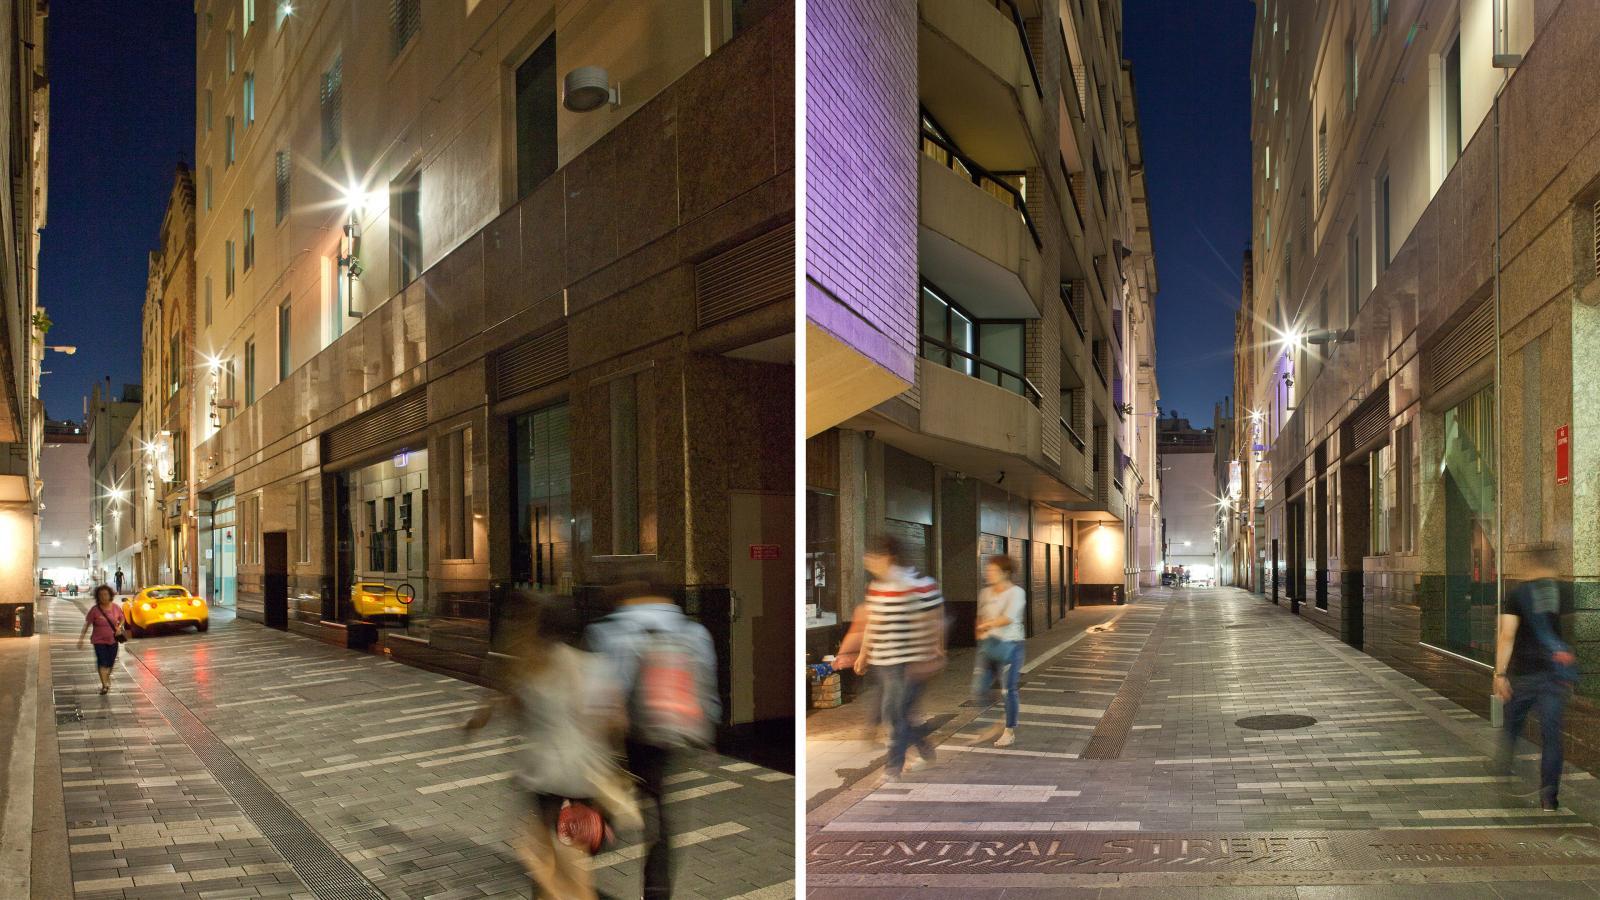 George St Laneways Photo 2